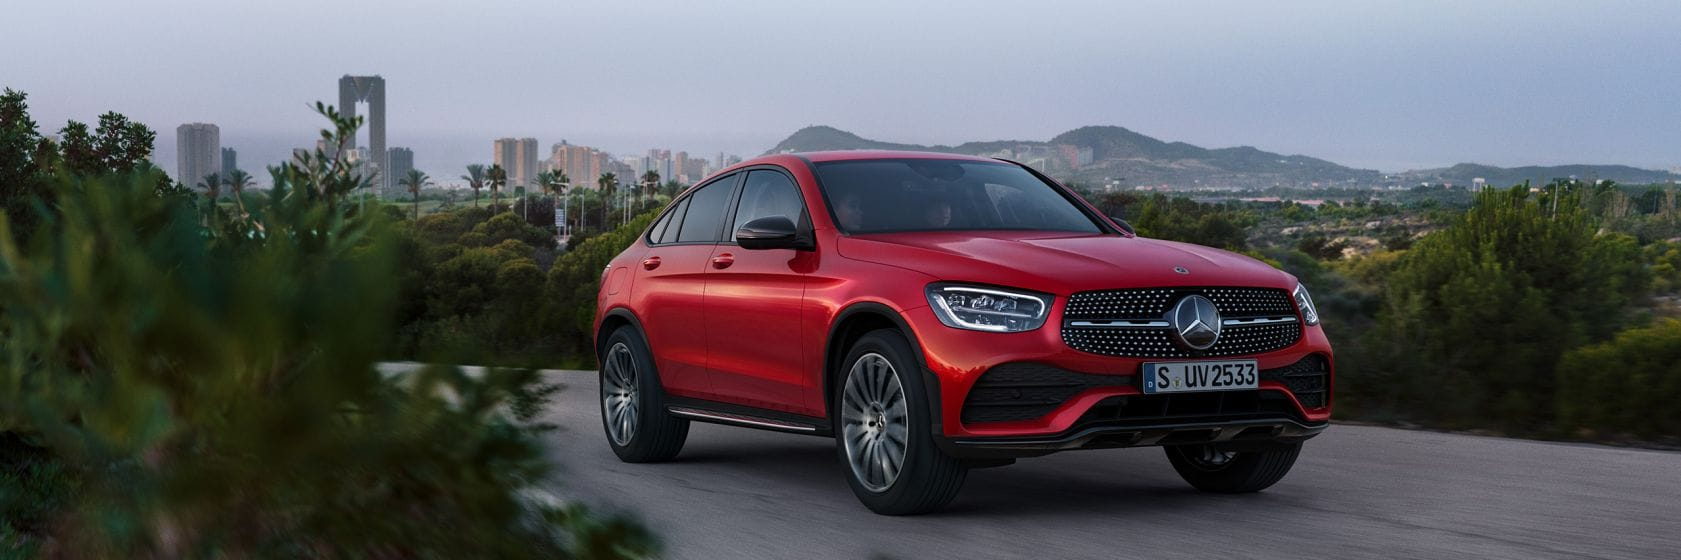 Интерьер и экстерьер Mercedes–Benz GLC Coupe